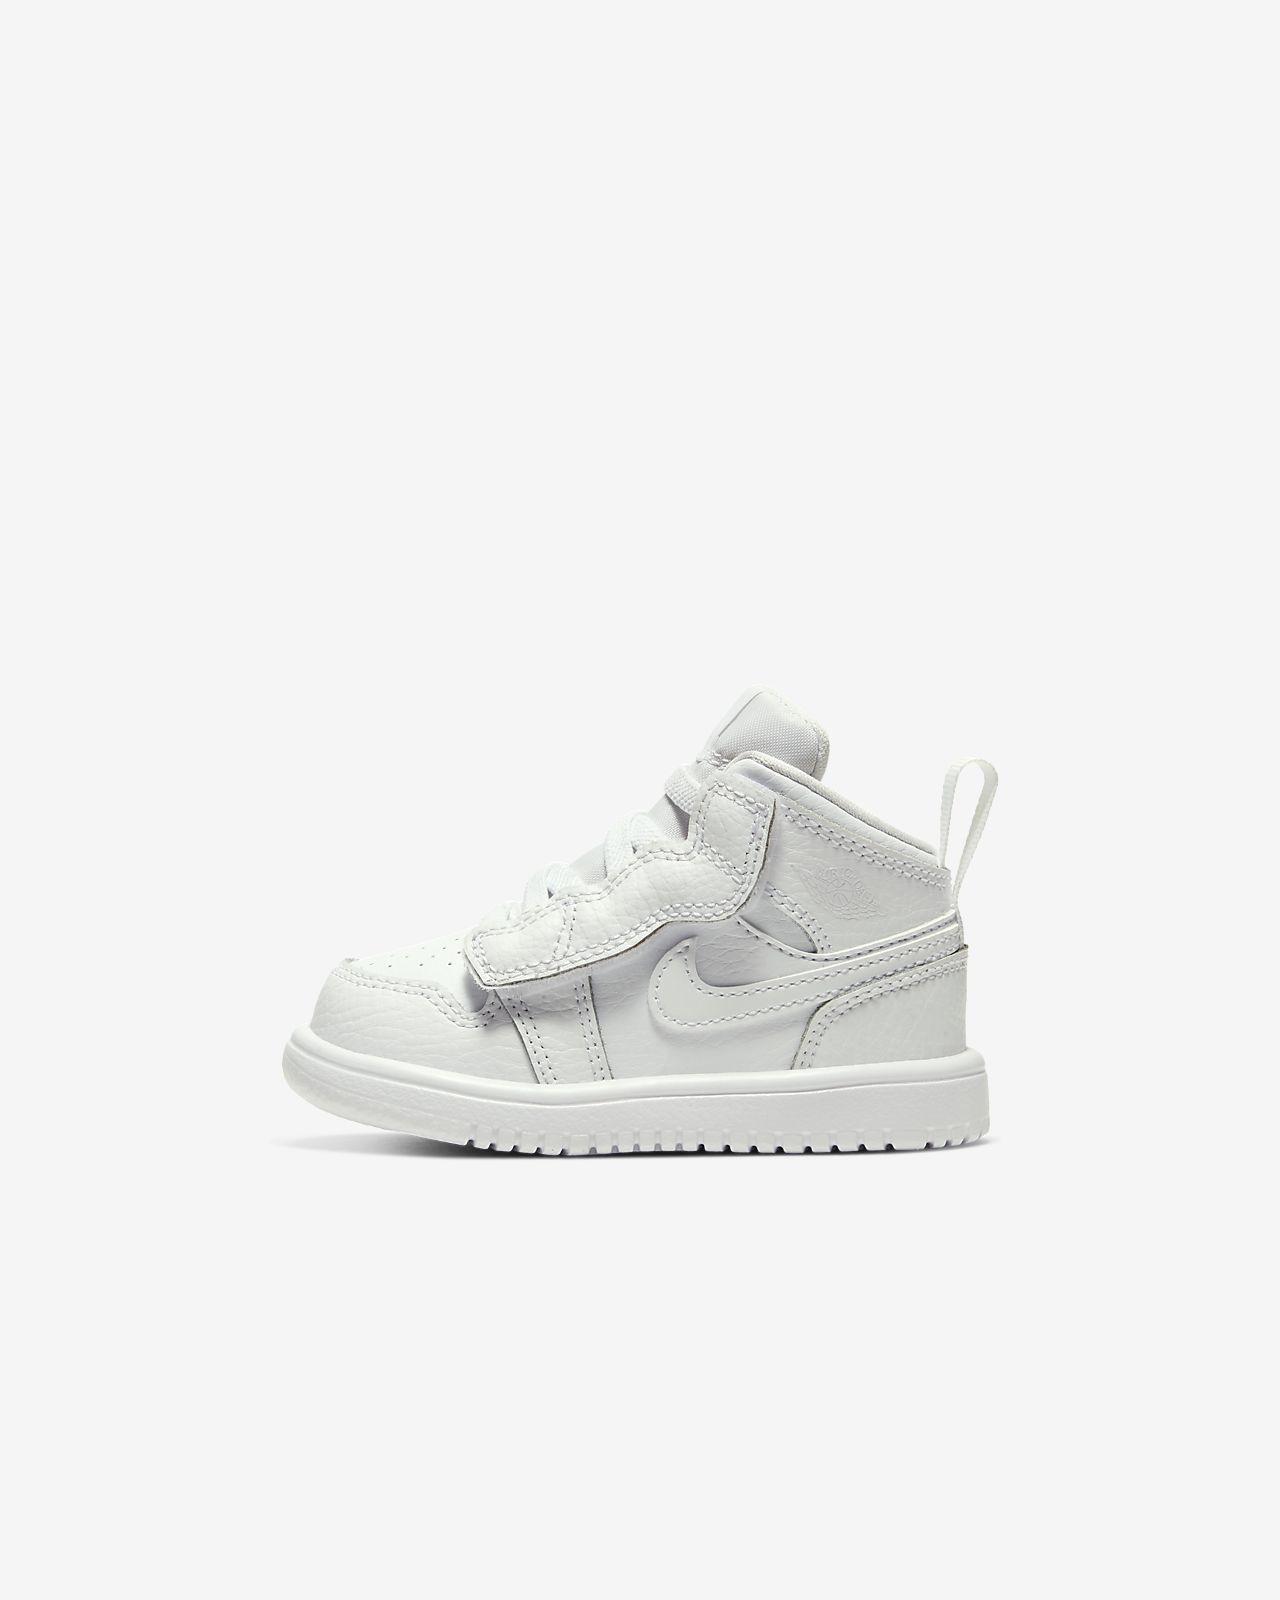 Air Jordan 1 Mid Alt Baby & Toddler Shoe